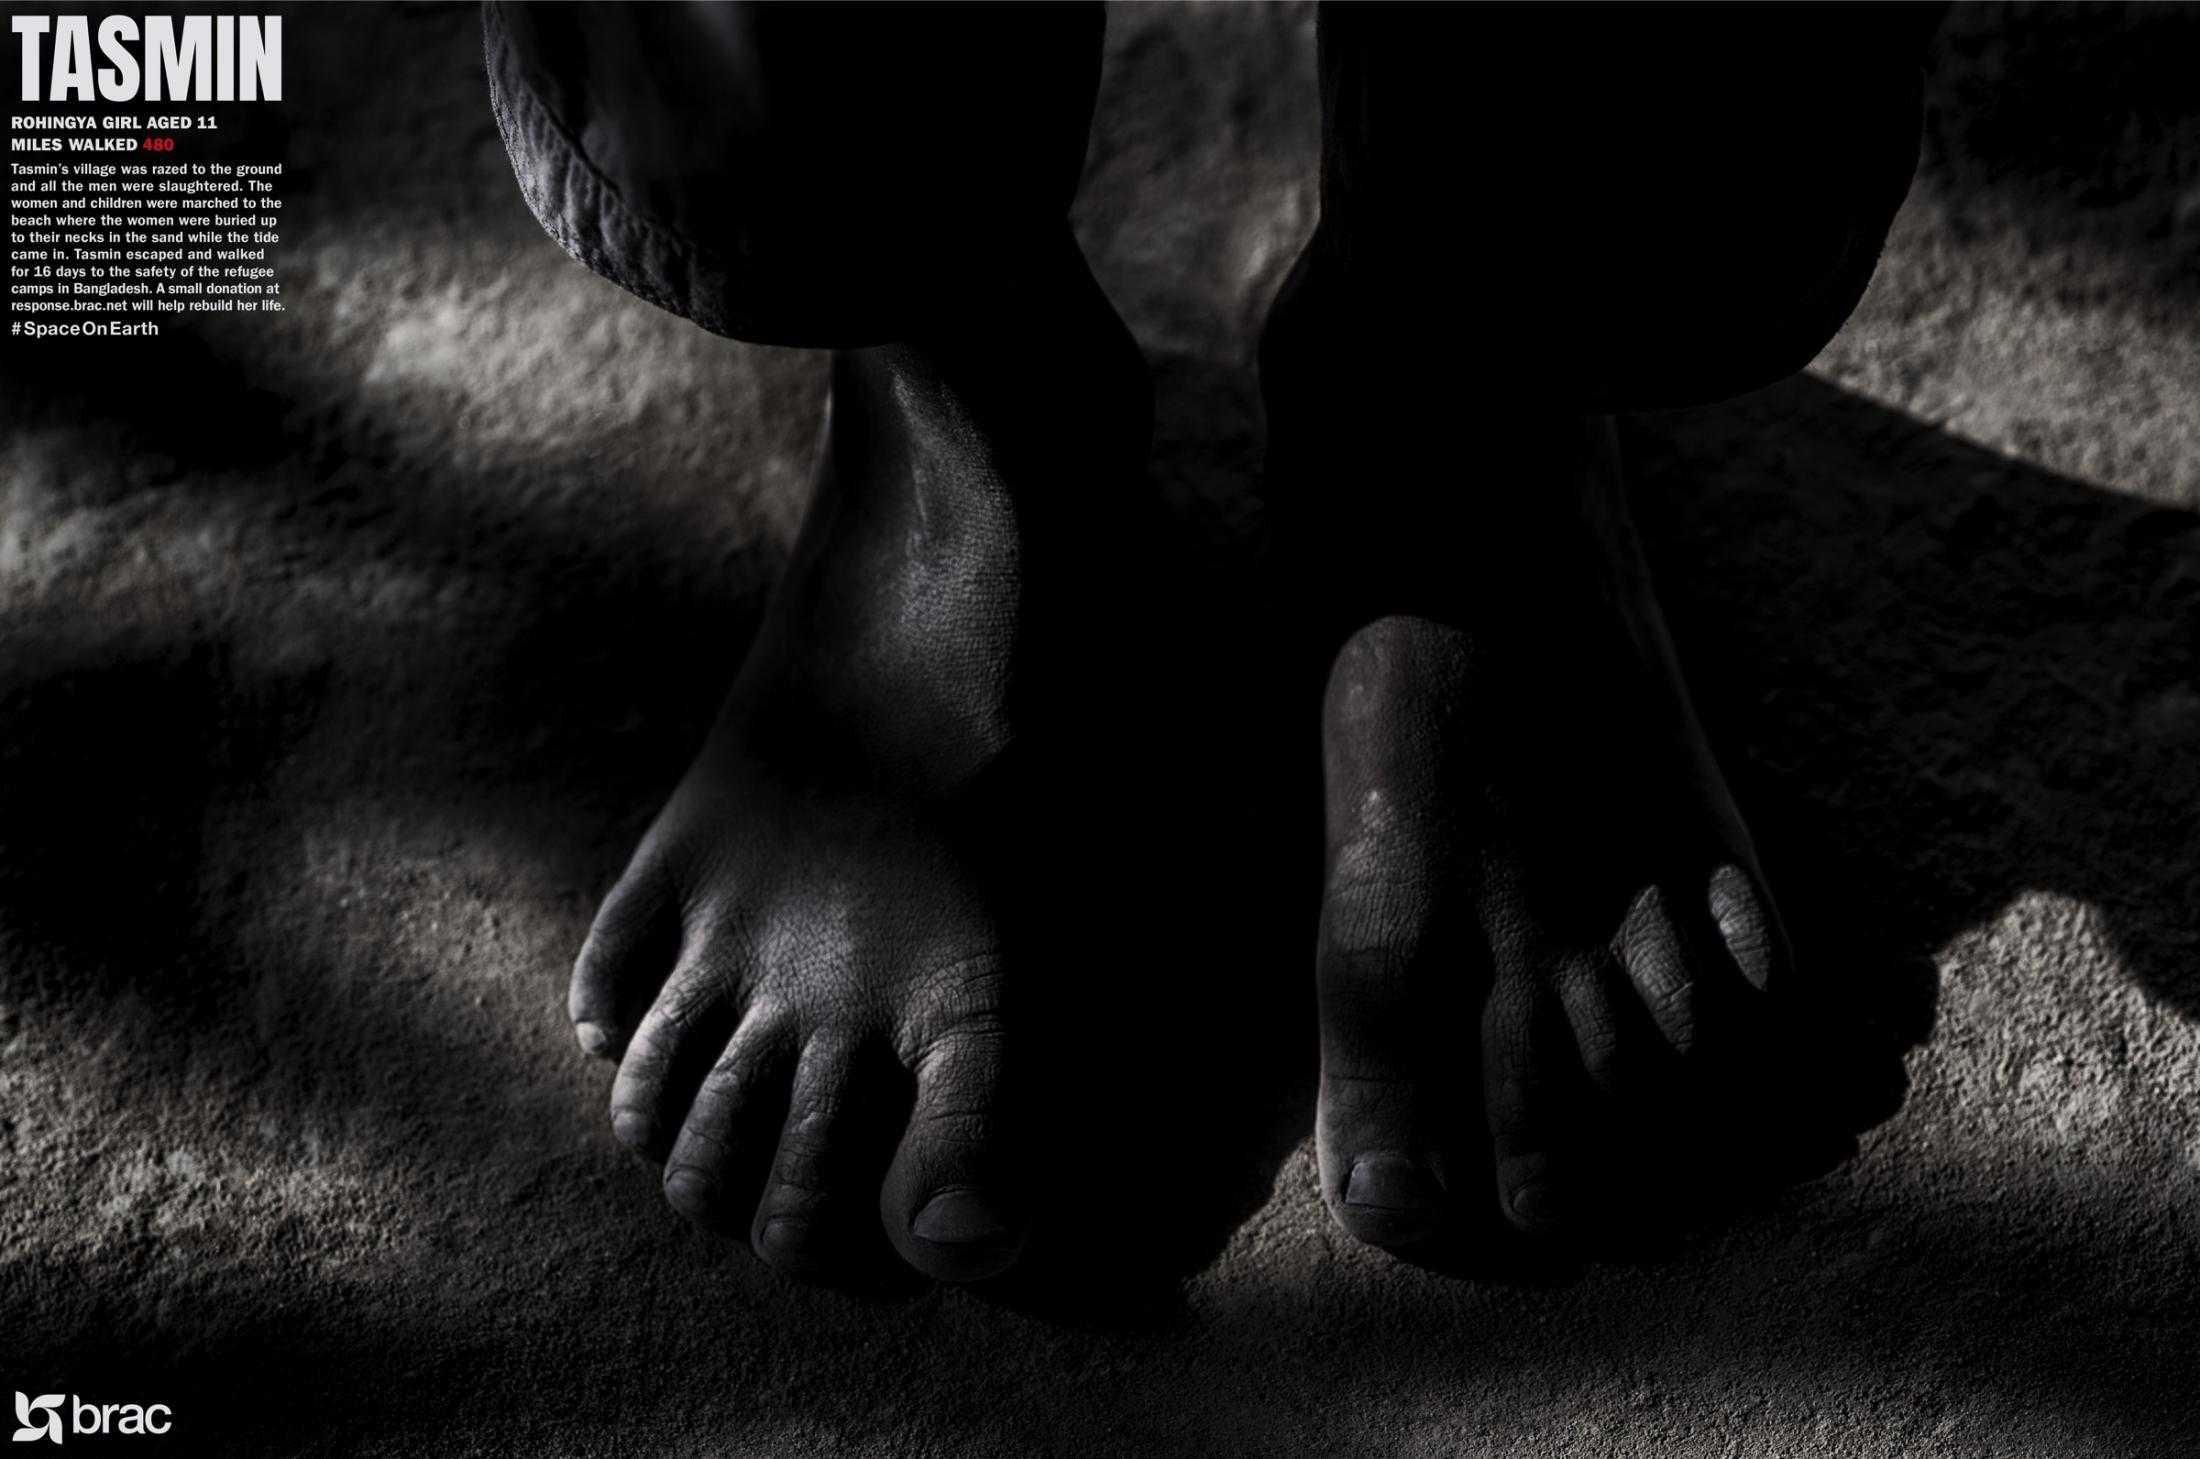 feet_r14_brac2_thumb